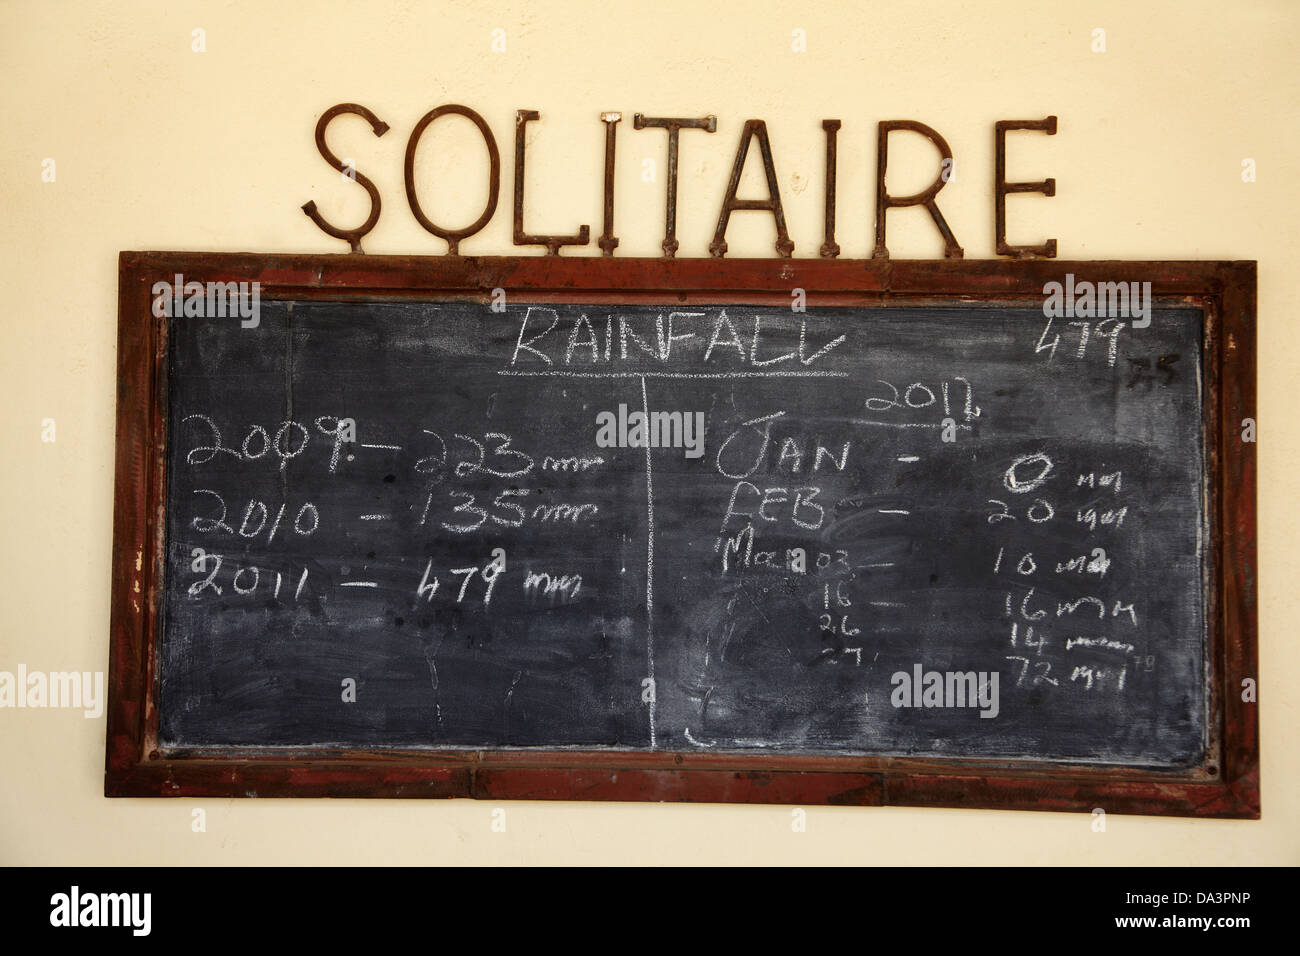 Solitaire rainfall statistics, Namib Desert, Namibia, Africa - Stock Image